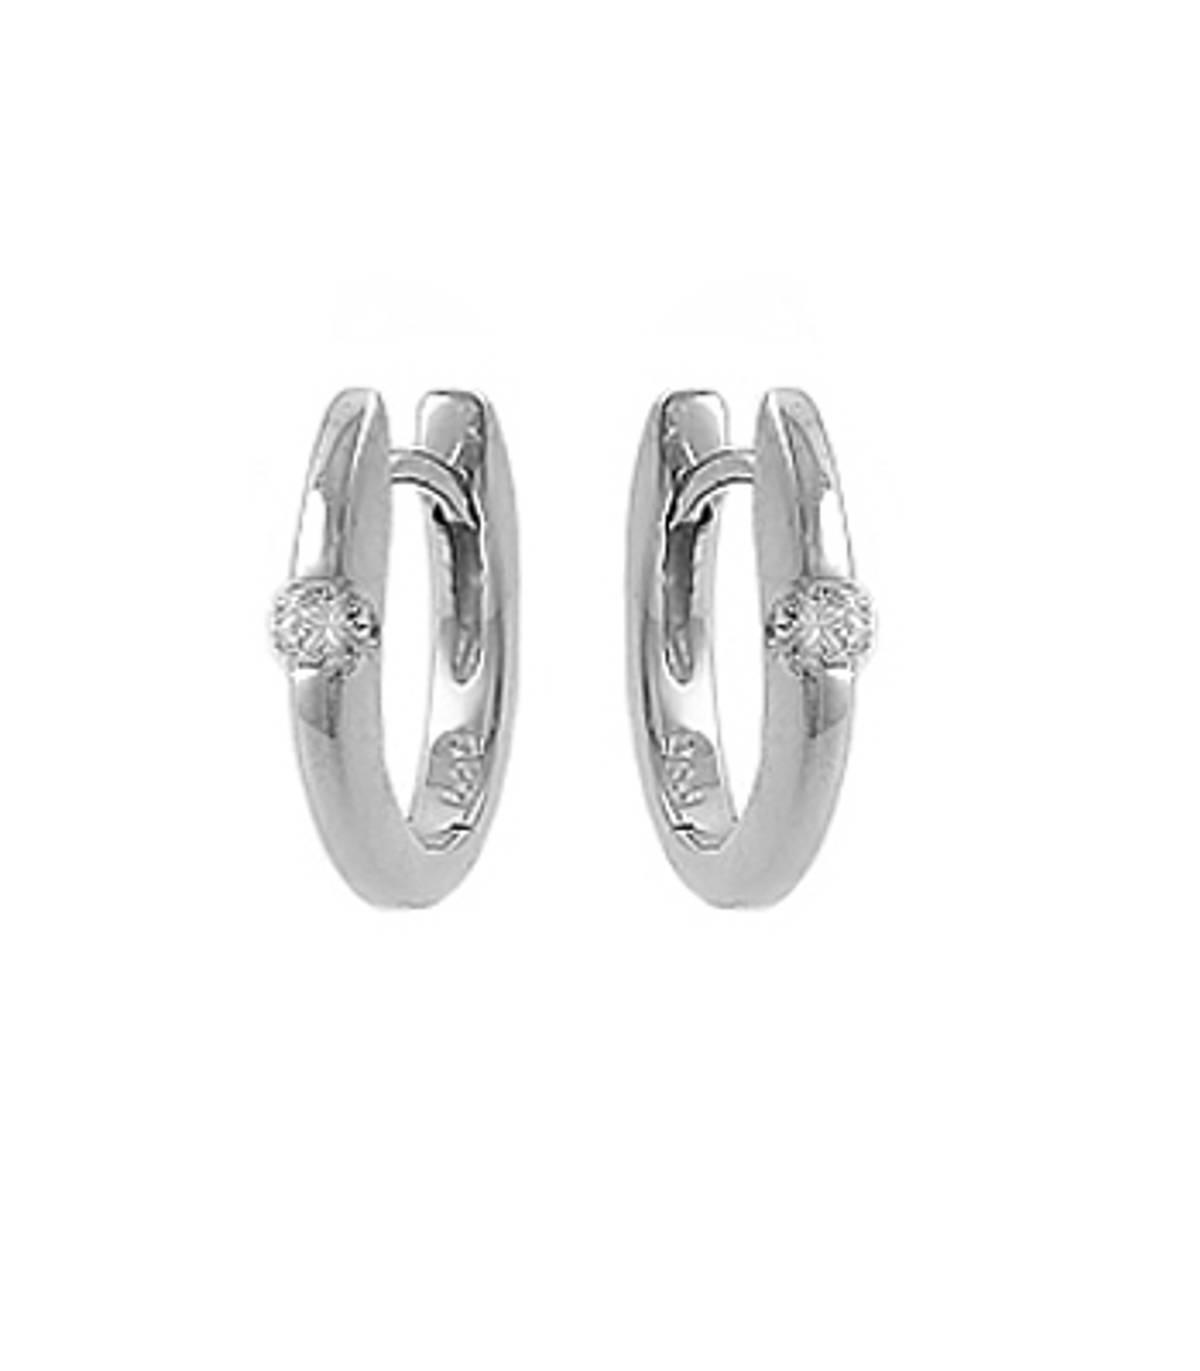 18k white gold s/st brilliant cut diamond hoop earringsDETAILSCarat: total diamond weight 0.20ctsColour: G-HClarity: VS1Cut: Brilliant cutMetal: 18k white gold Made in Ireland